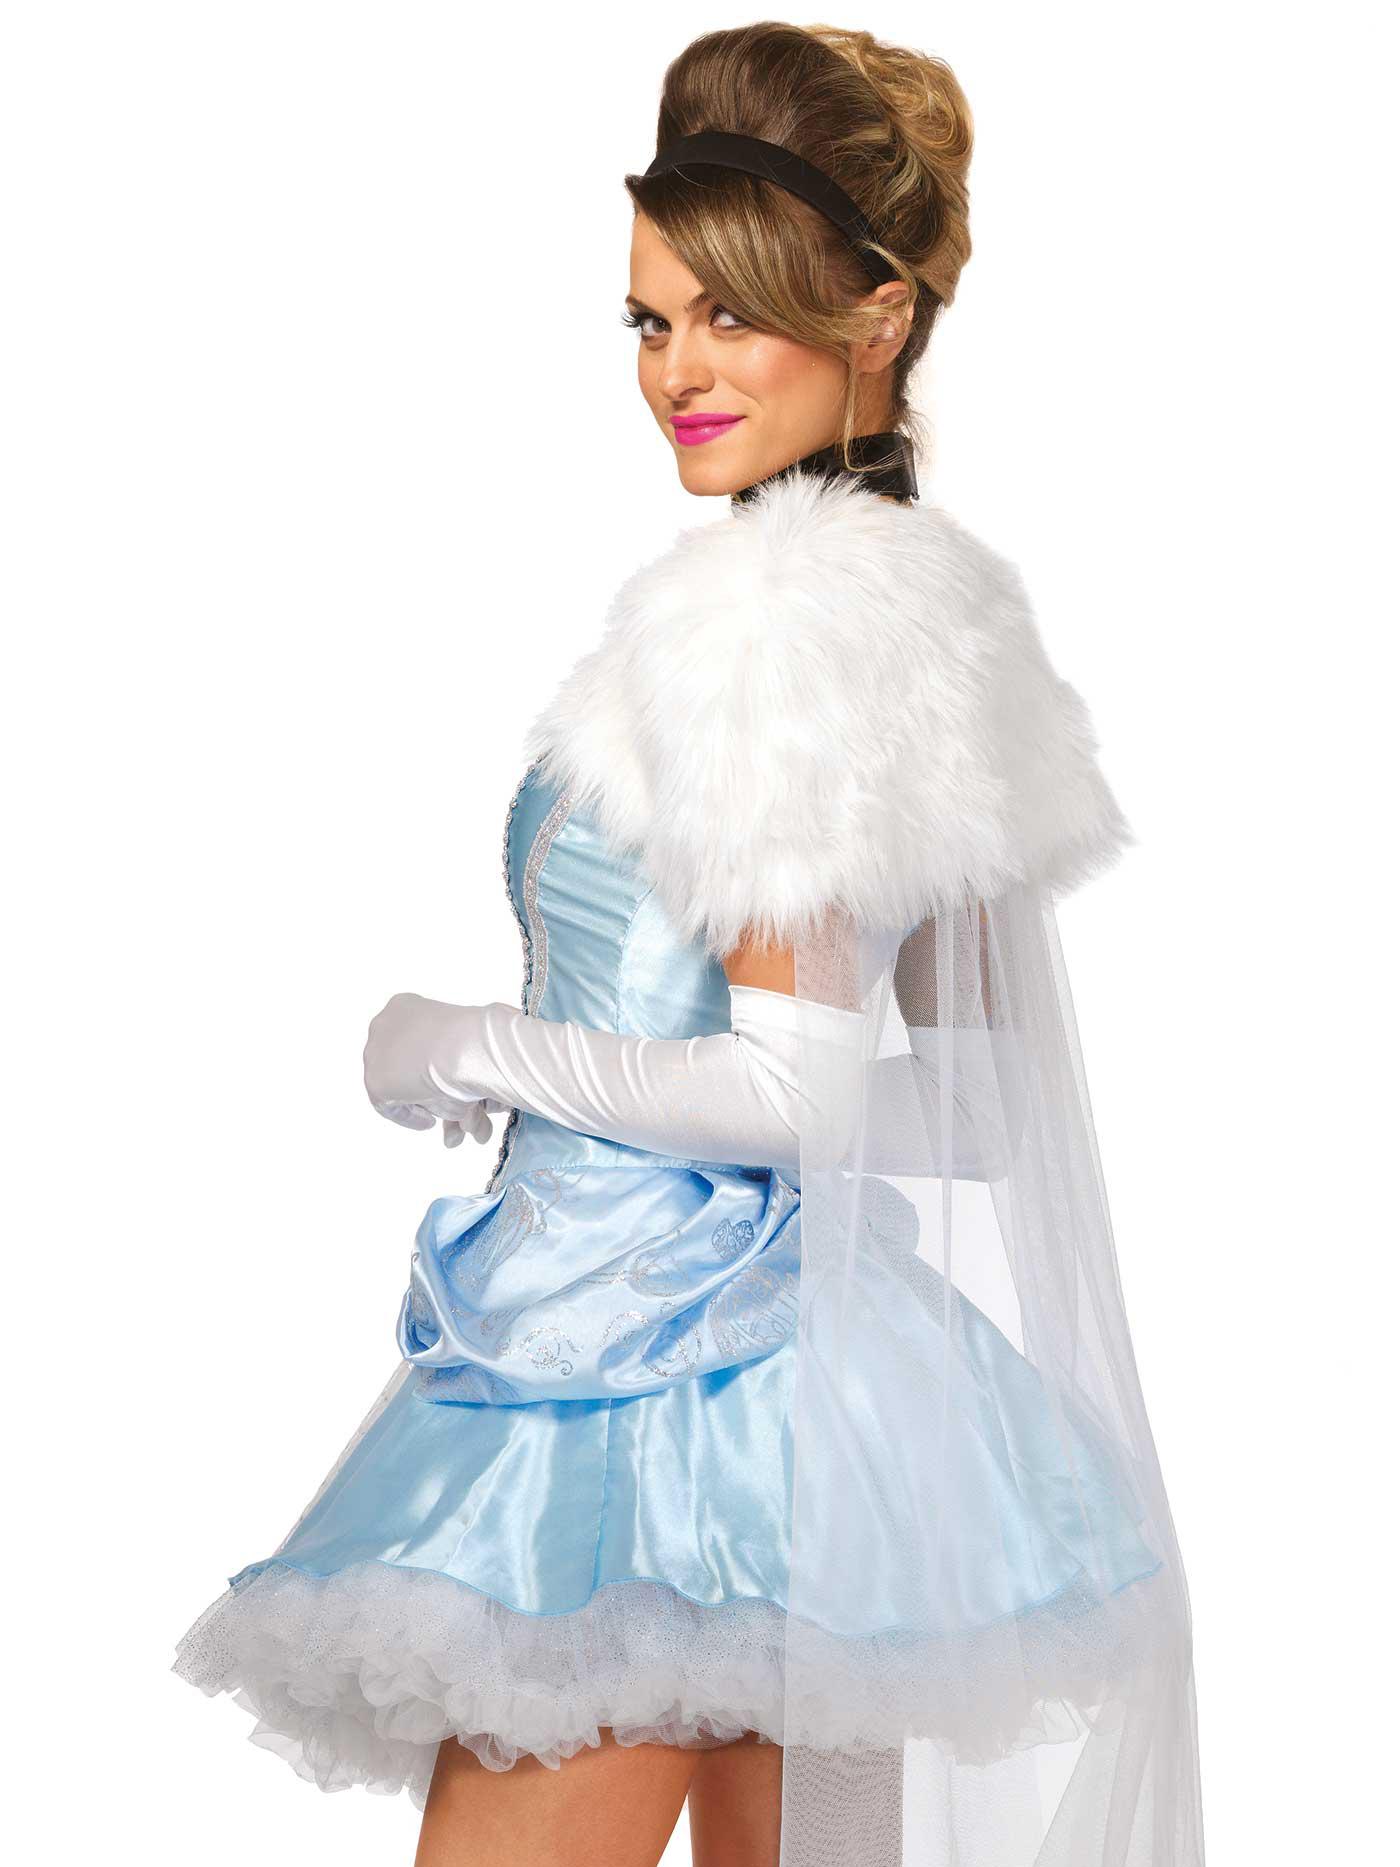 7d9dc7f76370 Costume Principessa Azzurra per donna  Costumi adulti